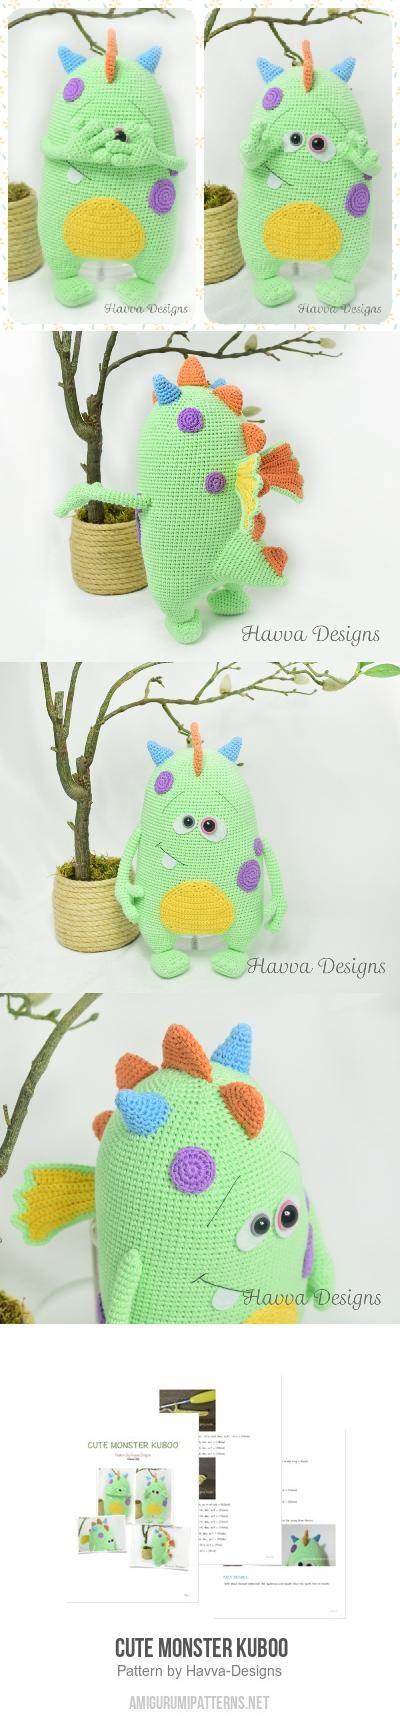 Cute Monster Kuboo amigurumi pattern